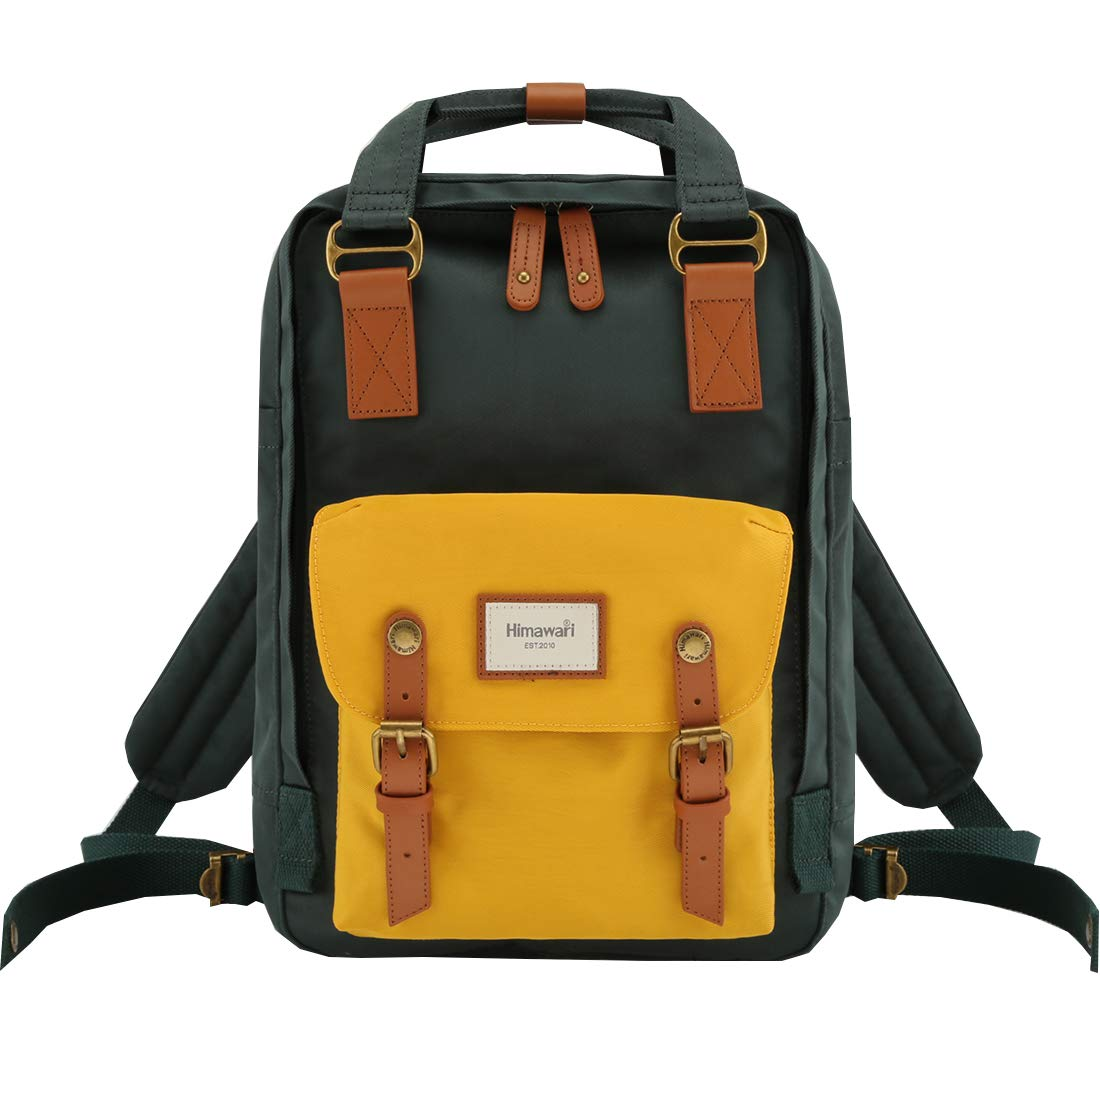 "Himawari School Waterproof Backpack 14.9"" College Vintage Travel Bag for Women,14 inch Laptop for Student (HM-56#)"